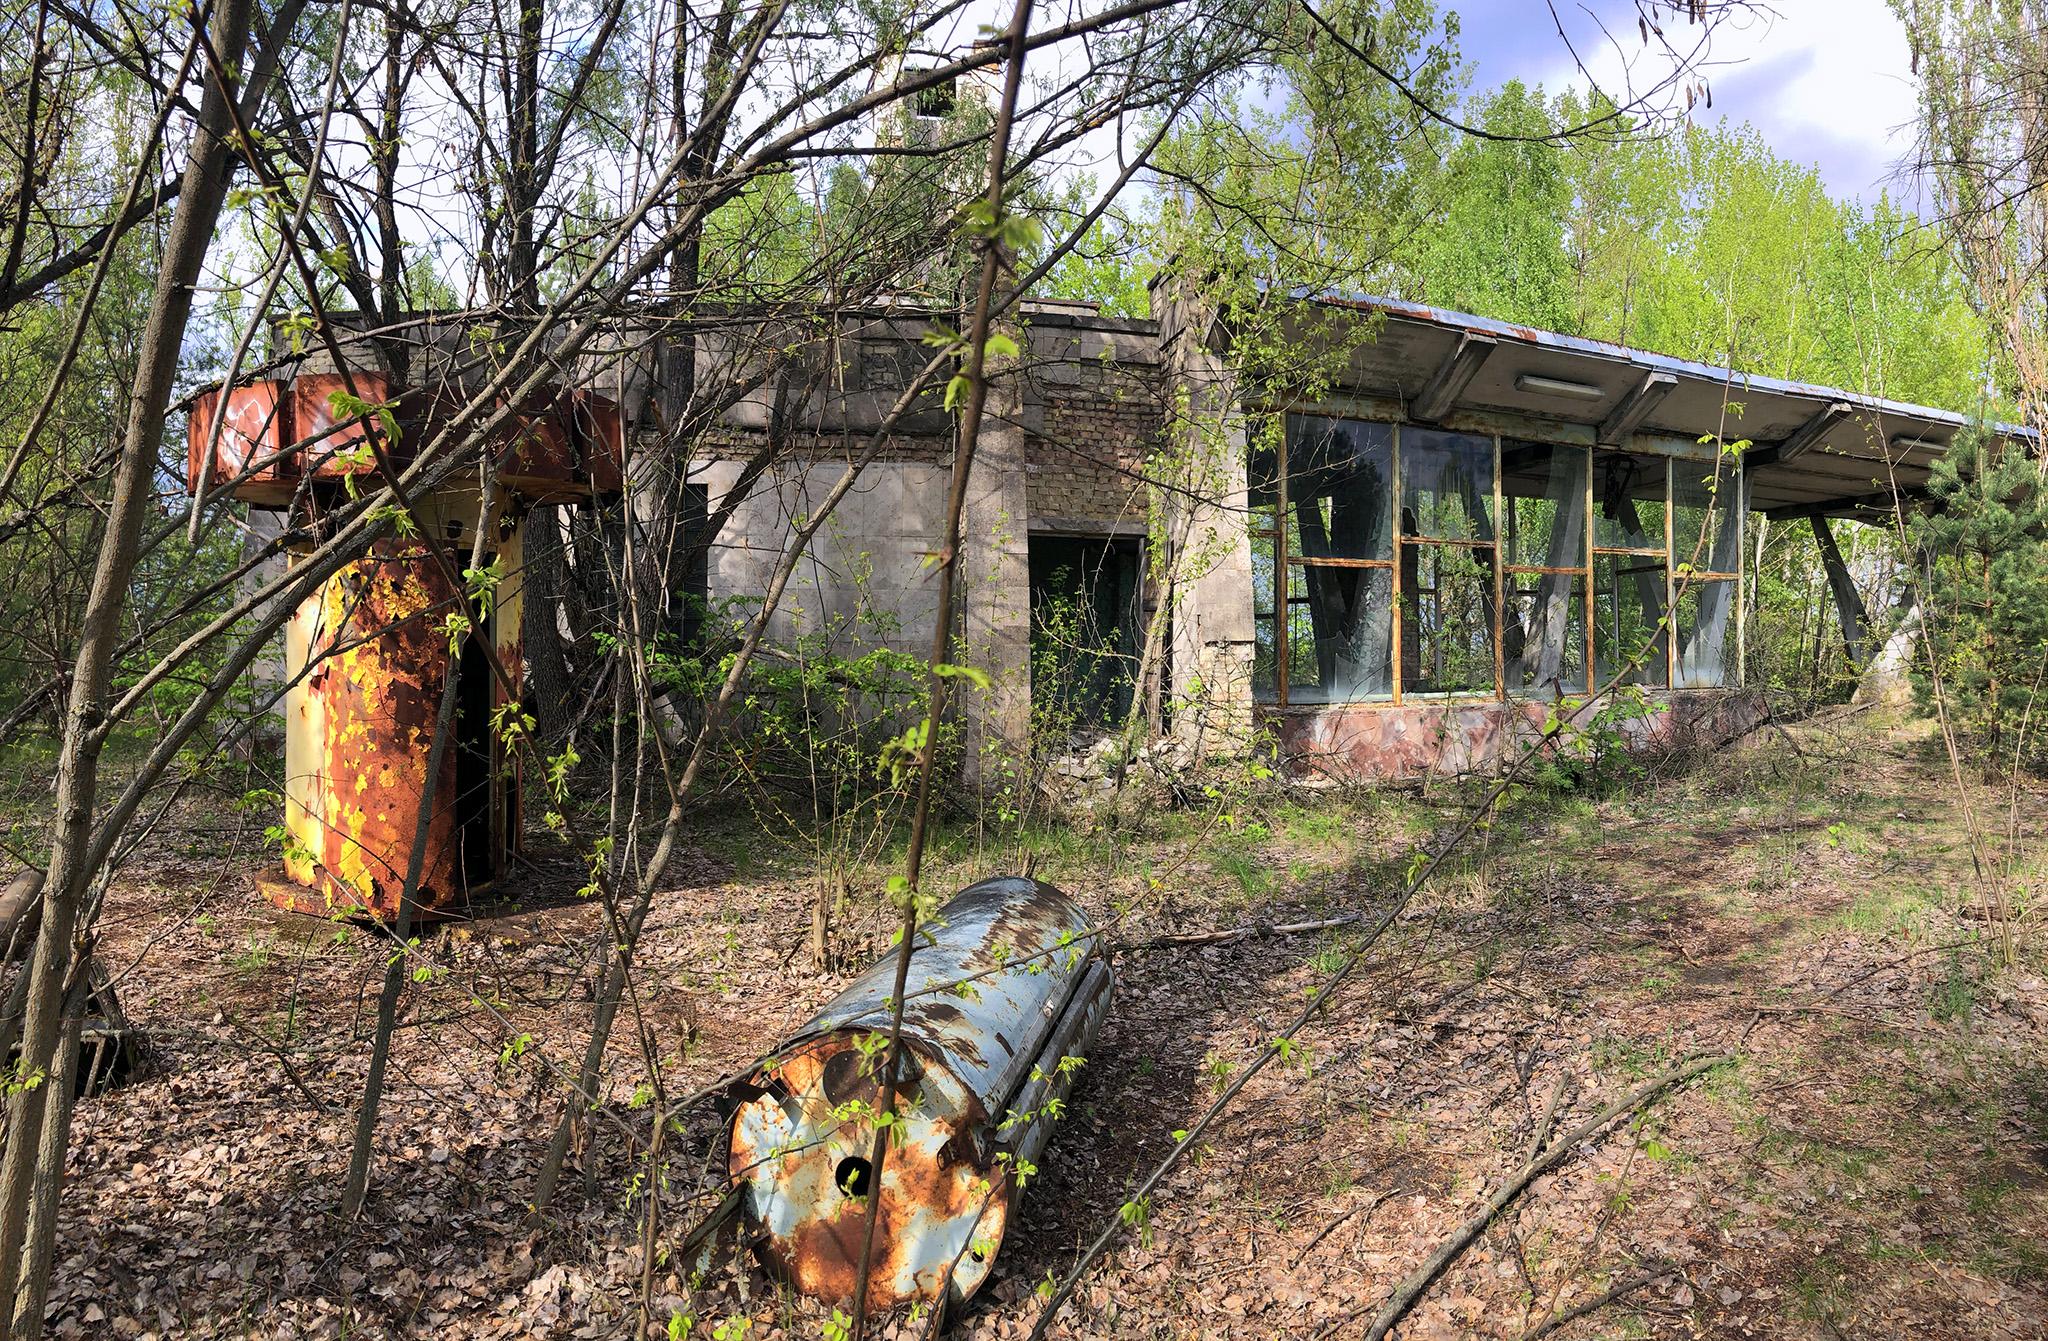 Visitar Chernóbil - Visitar Chernobyl Ucrania Ukraine Pripyat visitar chernóbil - 47045820584 2de2dd10d3 o - Visitar Chernóbil: el lugar más contaminado del planeta